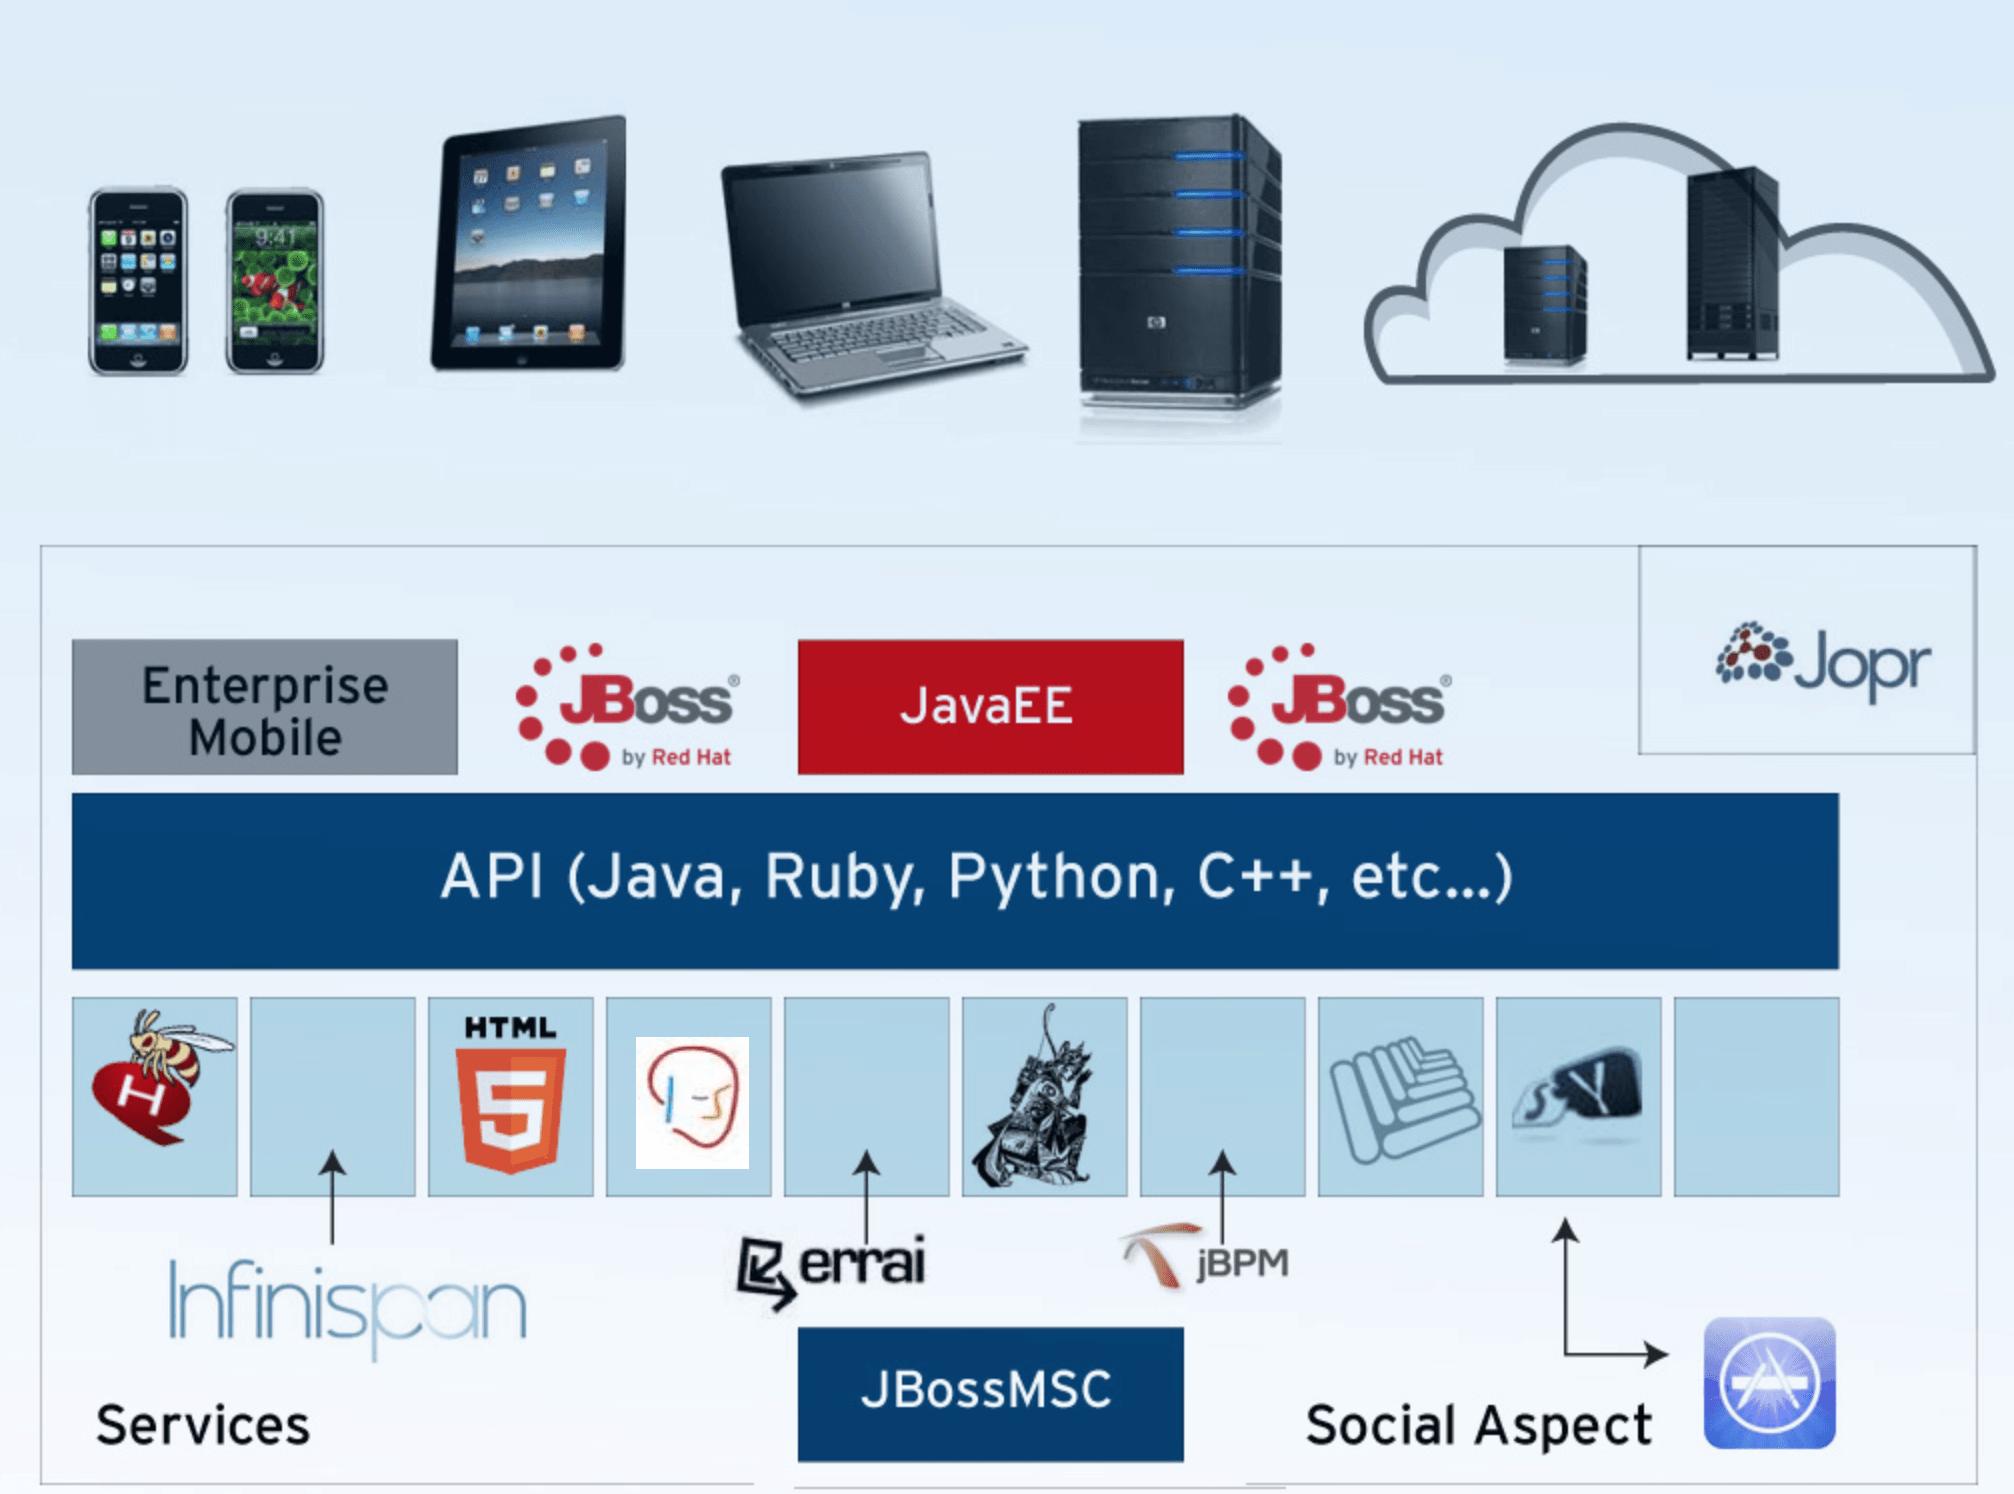 JBoss Work on Internet of Things